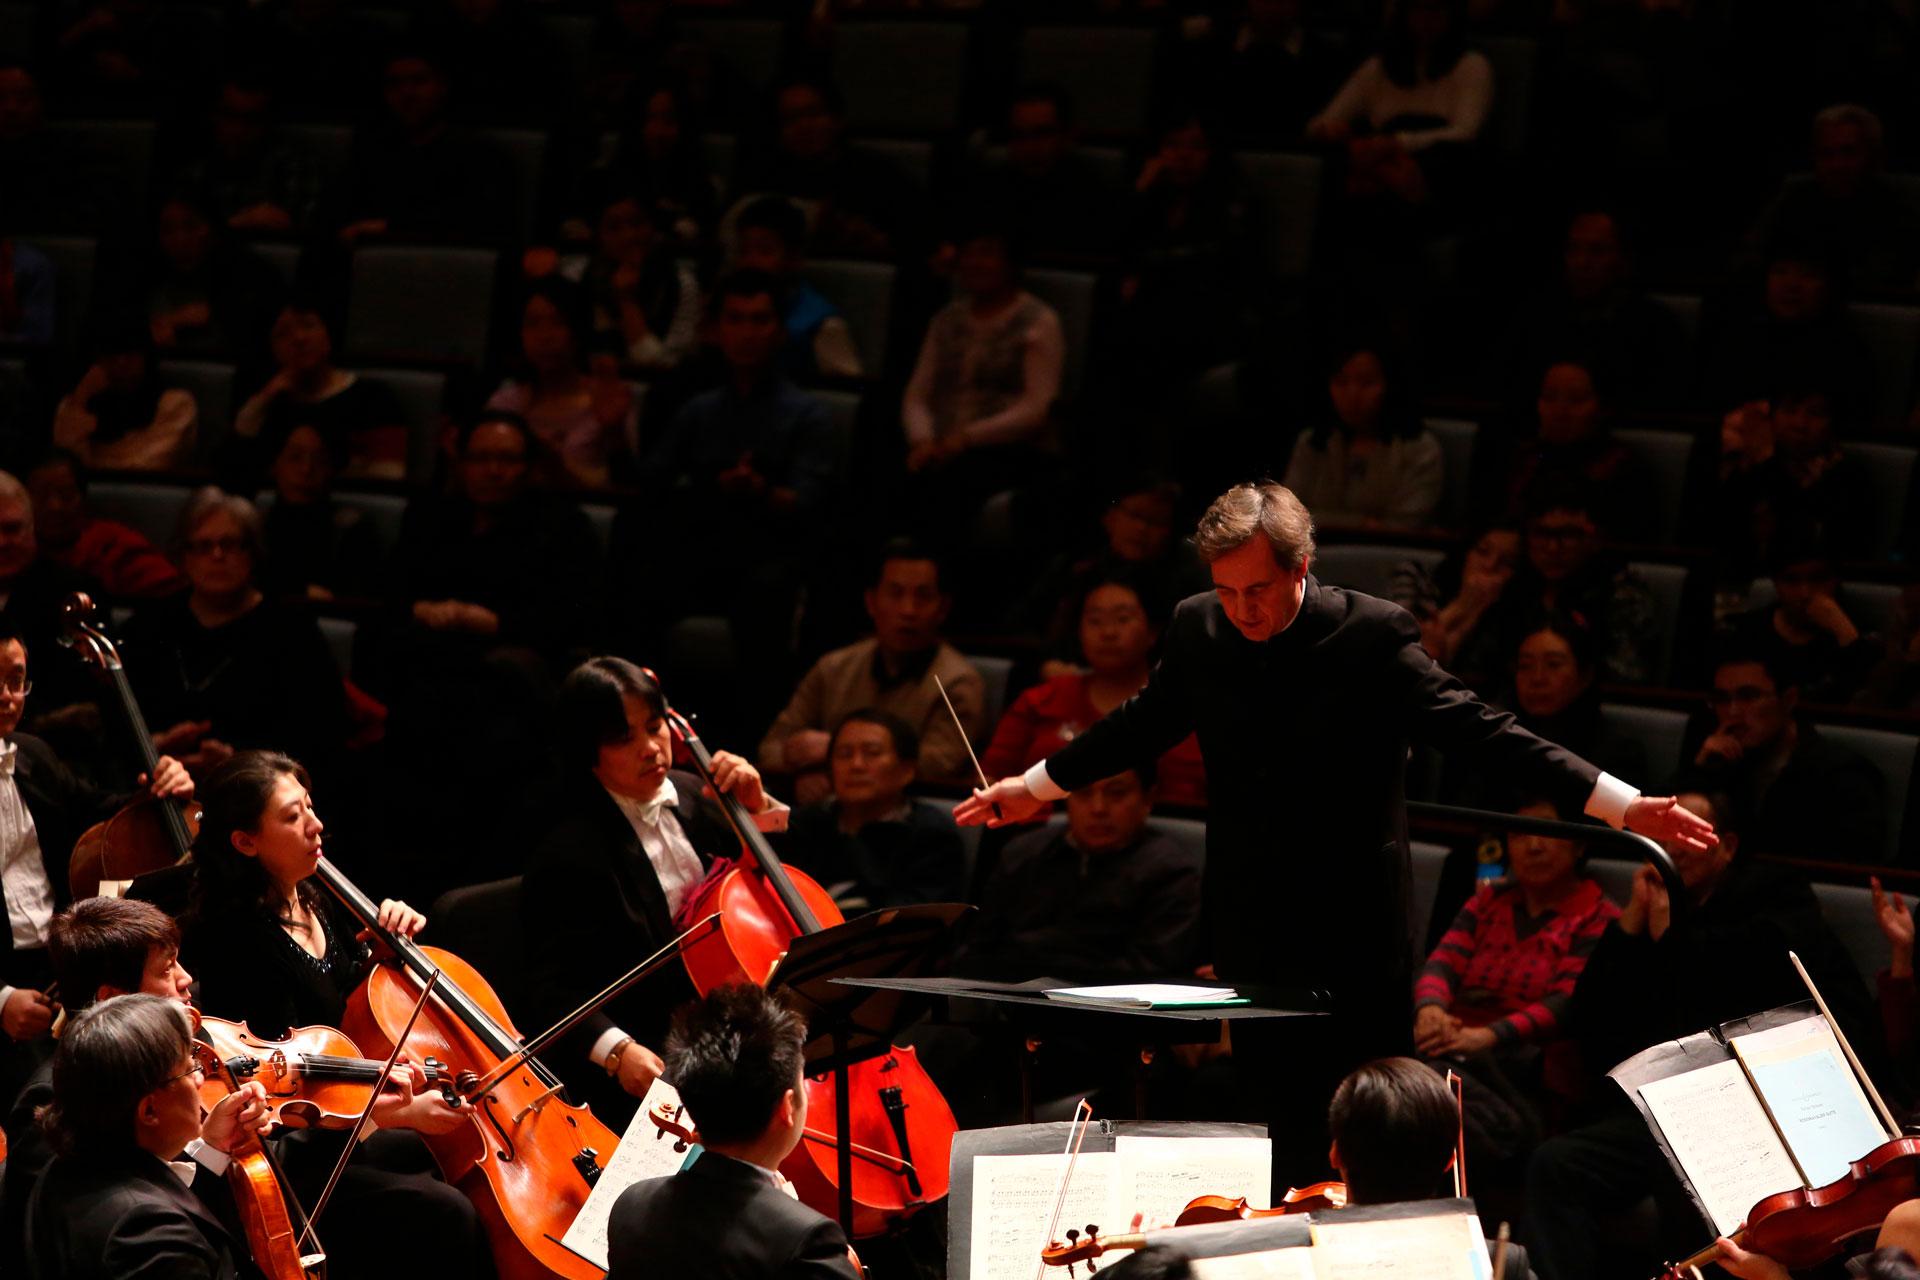 Marc Moncusí conducting